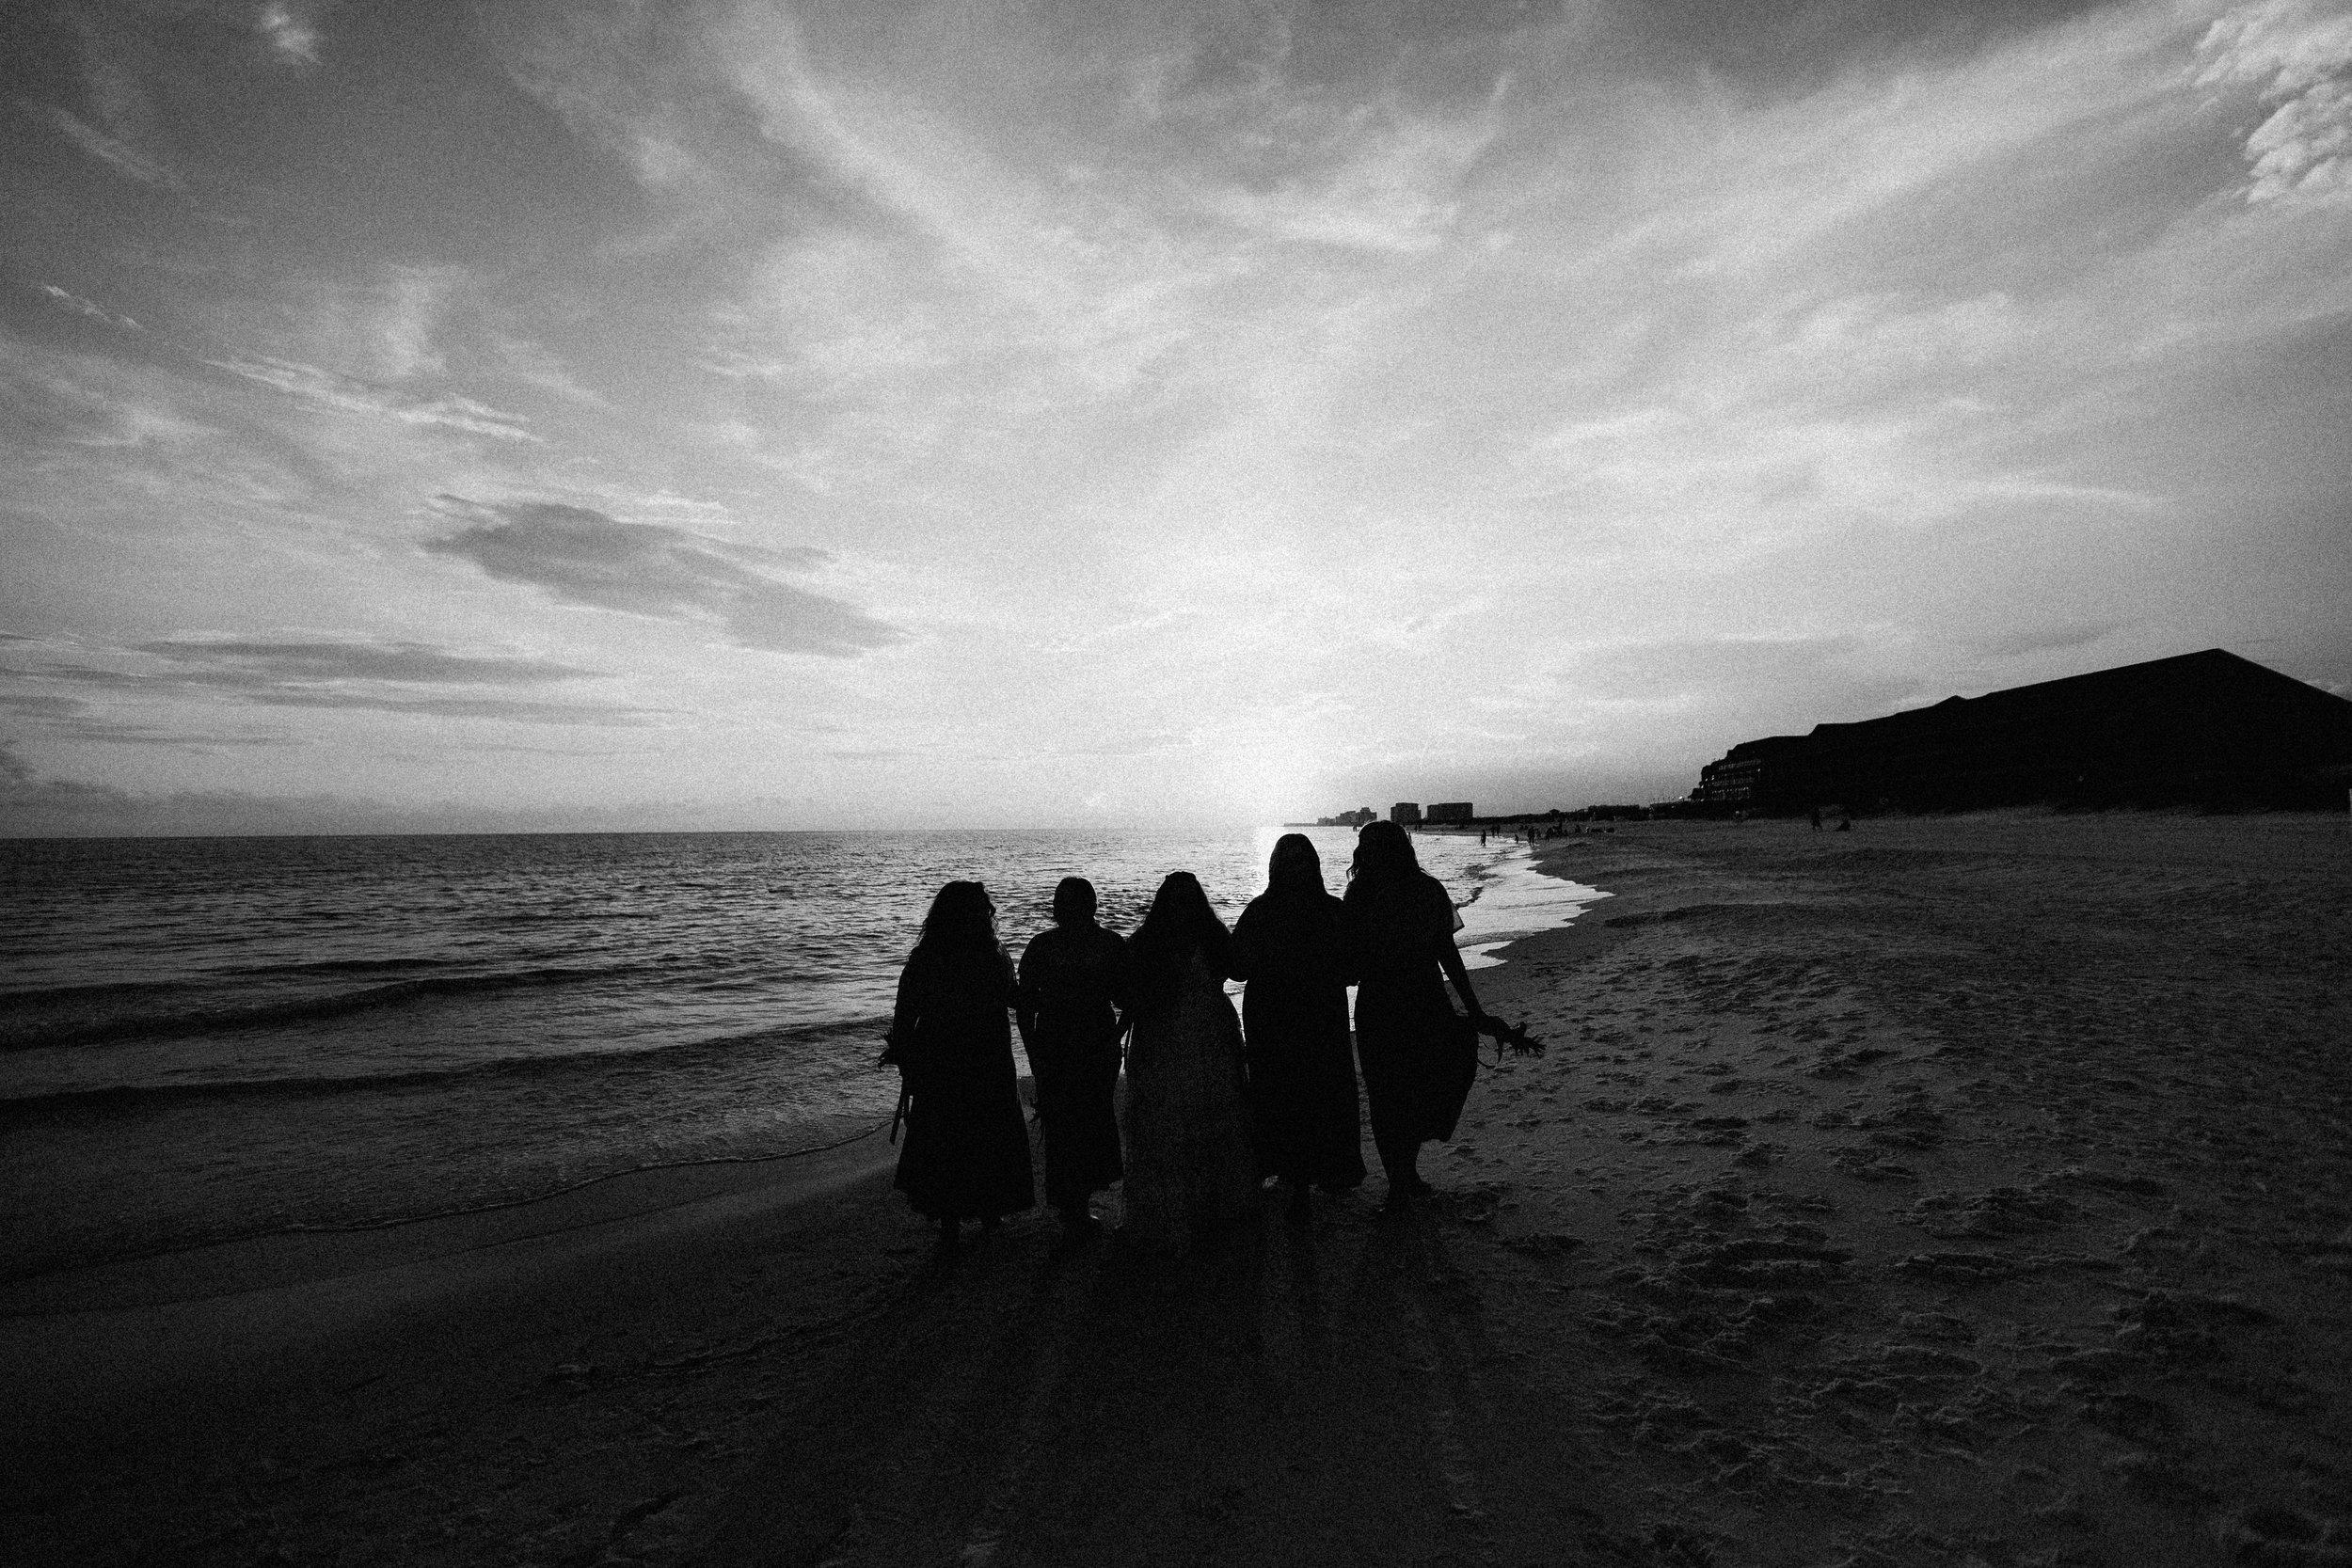 destin_sunset_beach_elopement_intimate_wedding_photographer_florida_documentary_1294.jpg